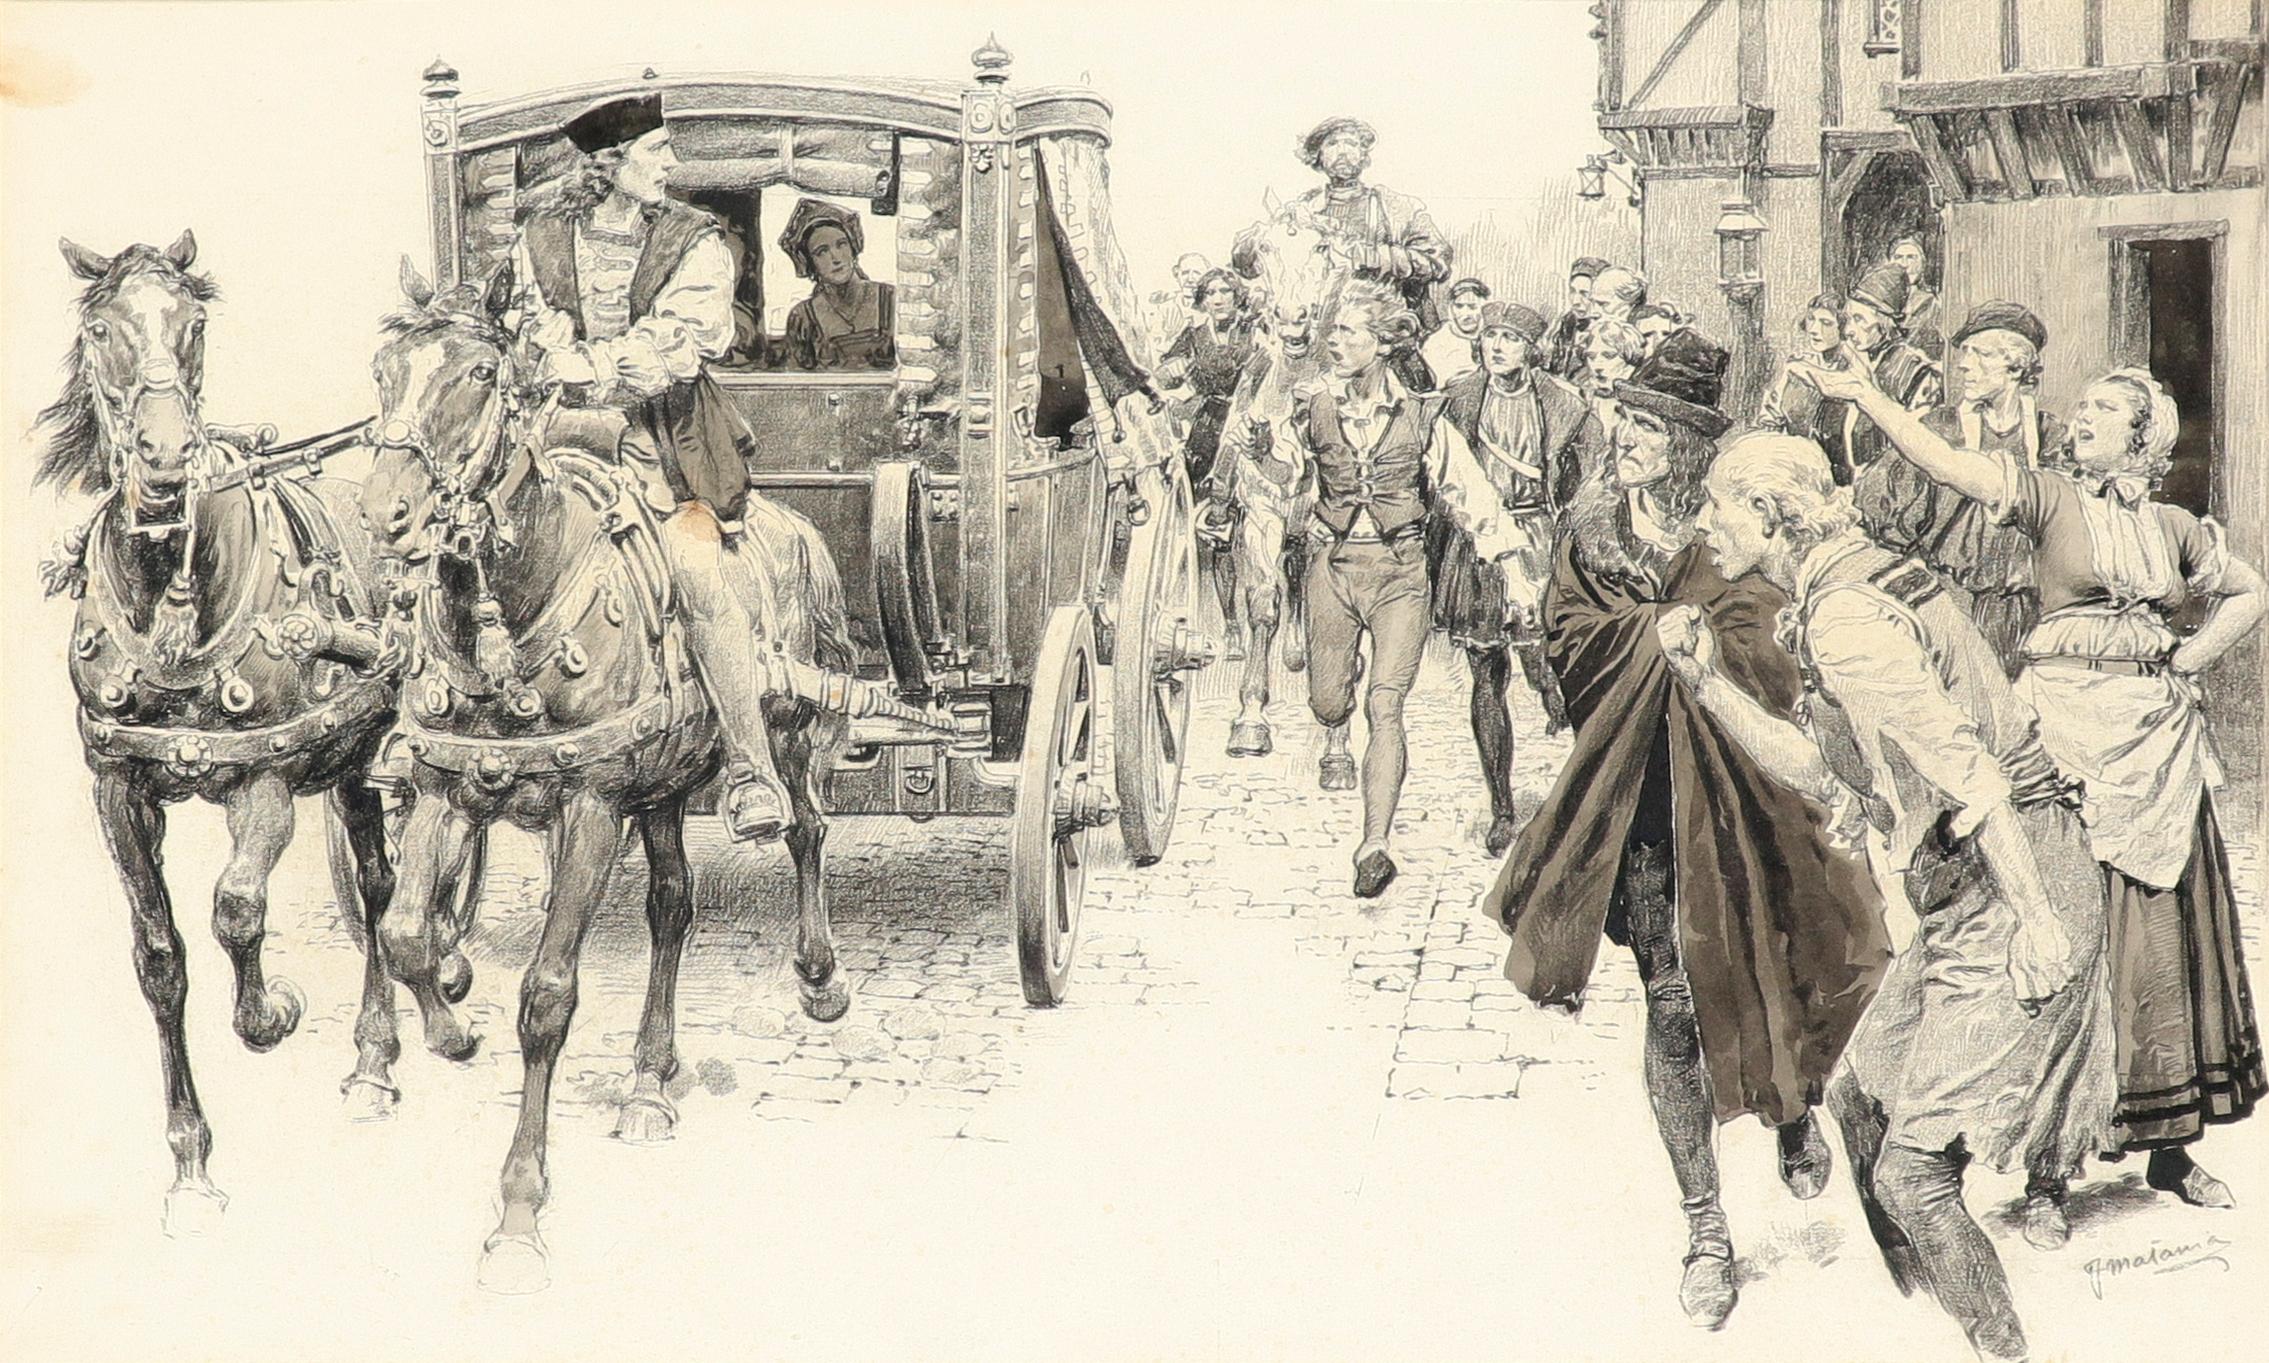 ‡Fortunio Matania RI (Italian 1881-1963) Anne Boyleyn being driven through the crowd Signed FMatania